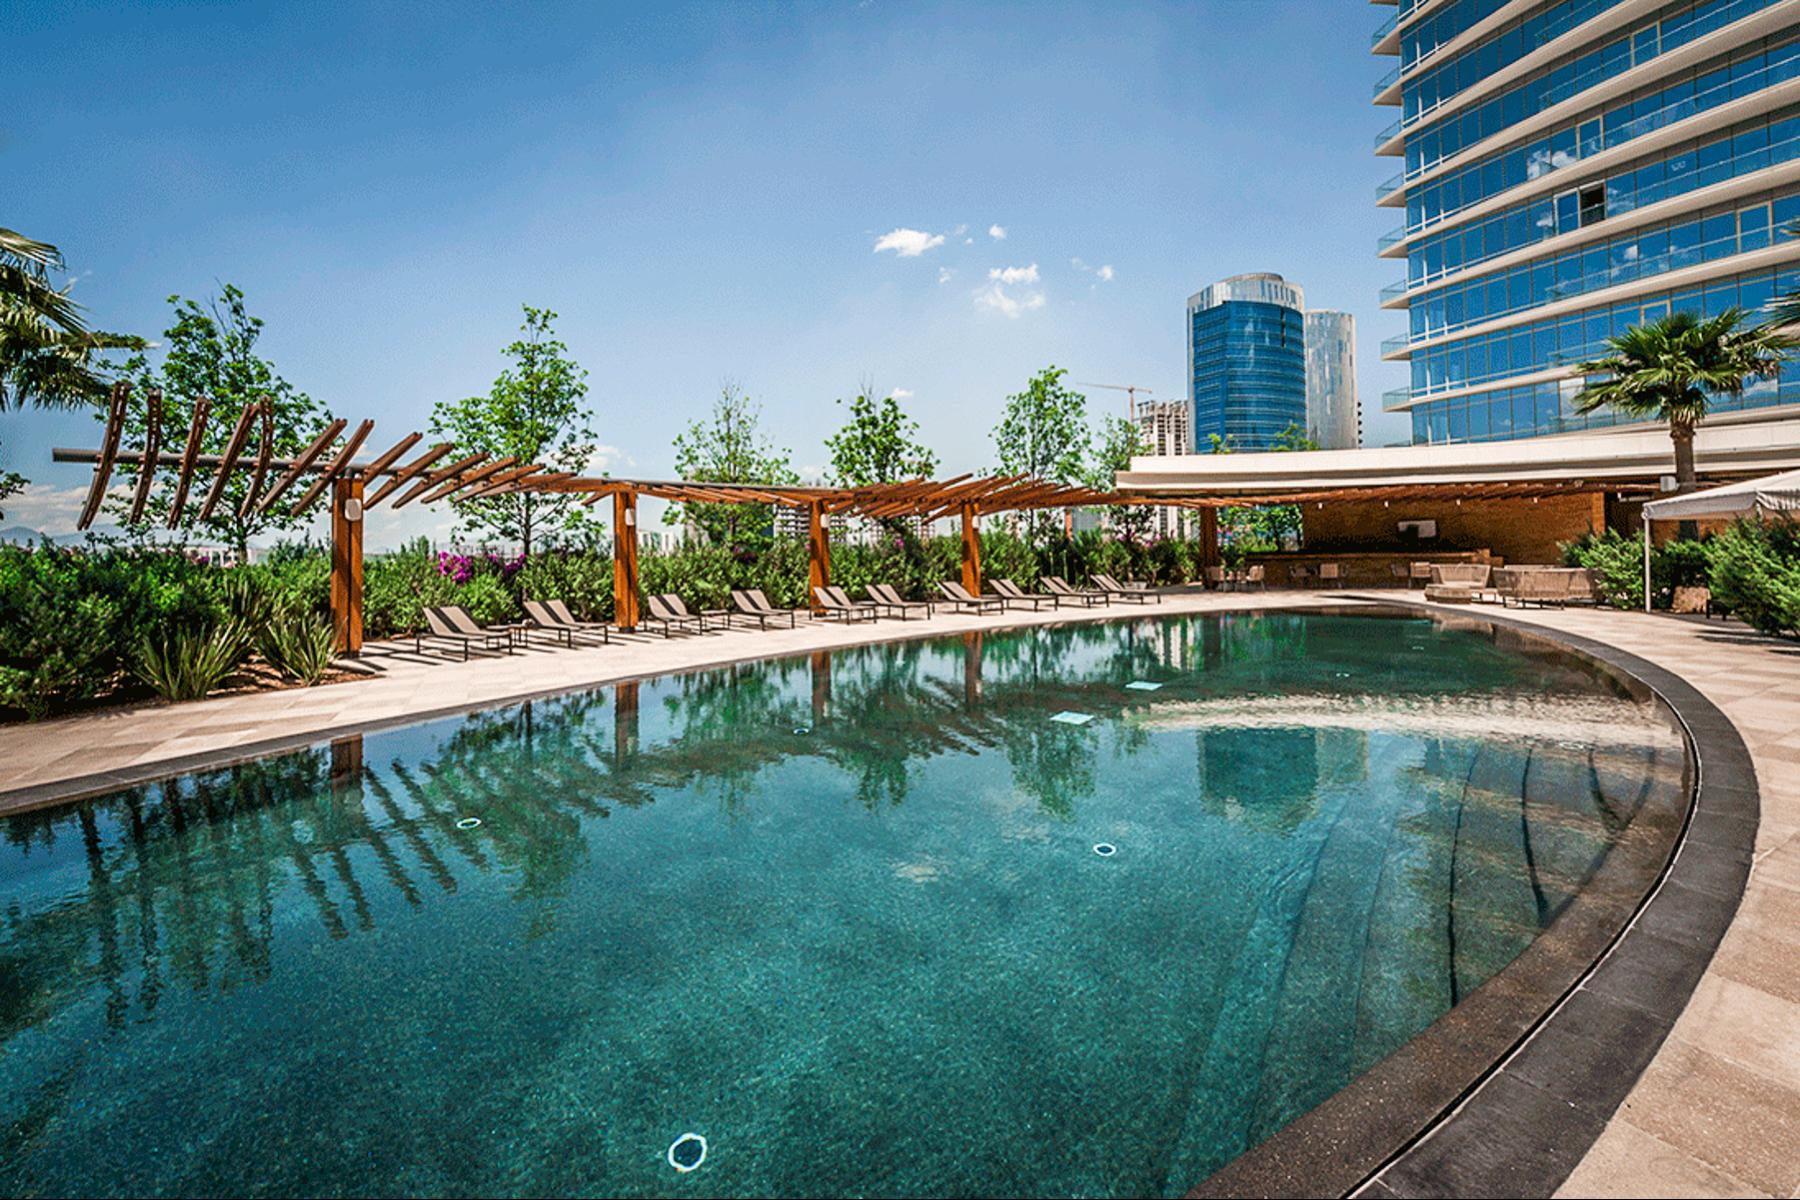 Additional photo for property listing at Extraordinario PH S-3502 Monterrey Monterrey, Nuevo Leon 66270 Mexico